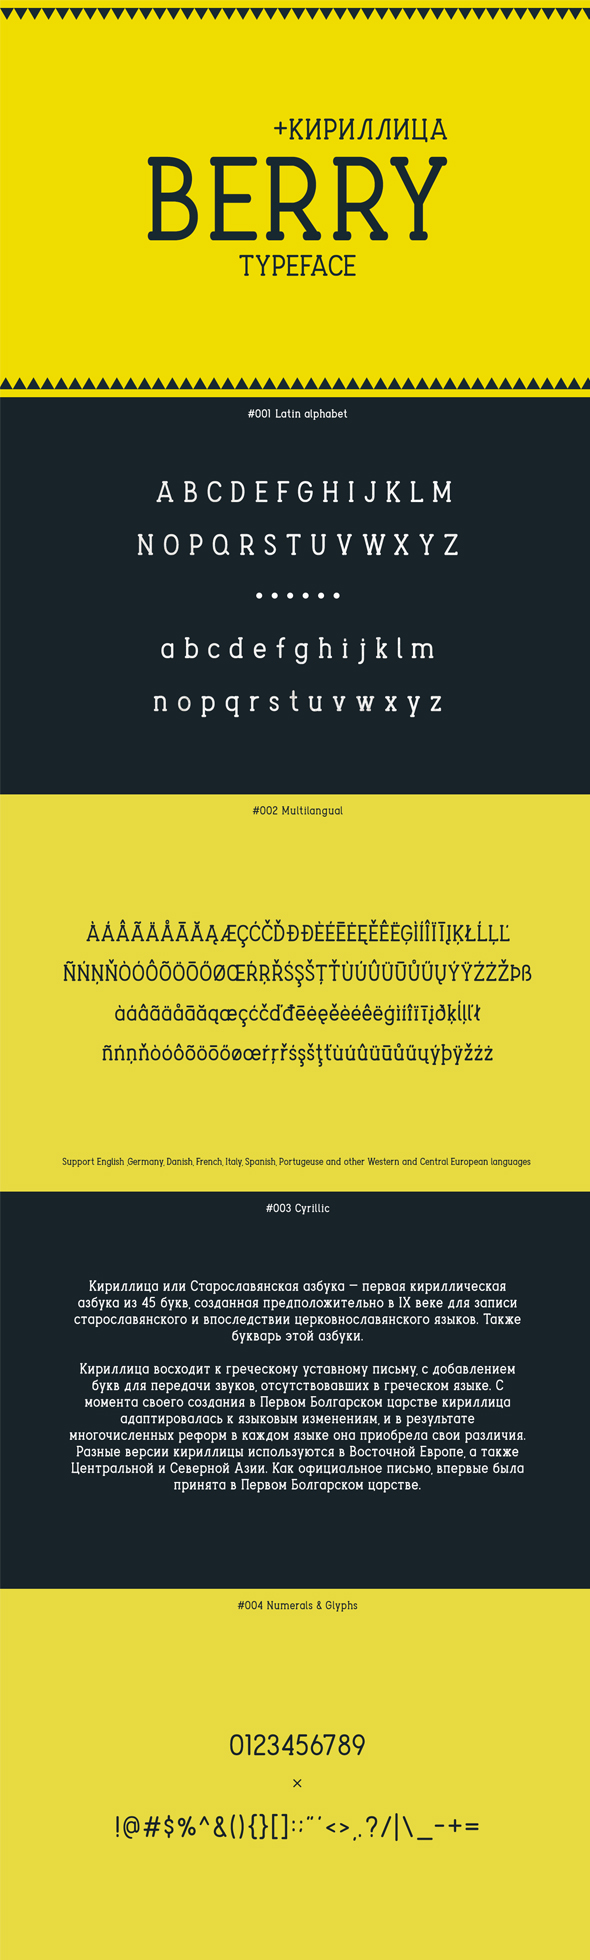 Berry Typeface - Condensed Sans-Serif